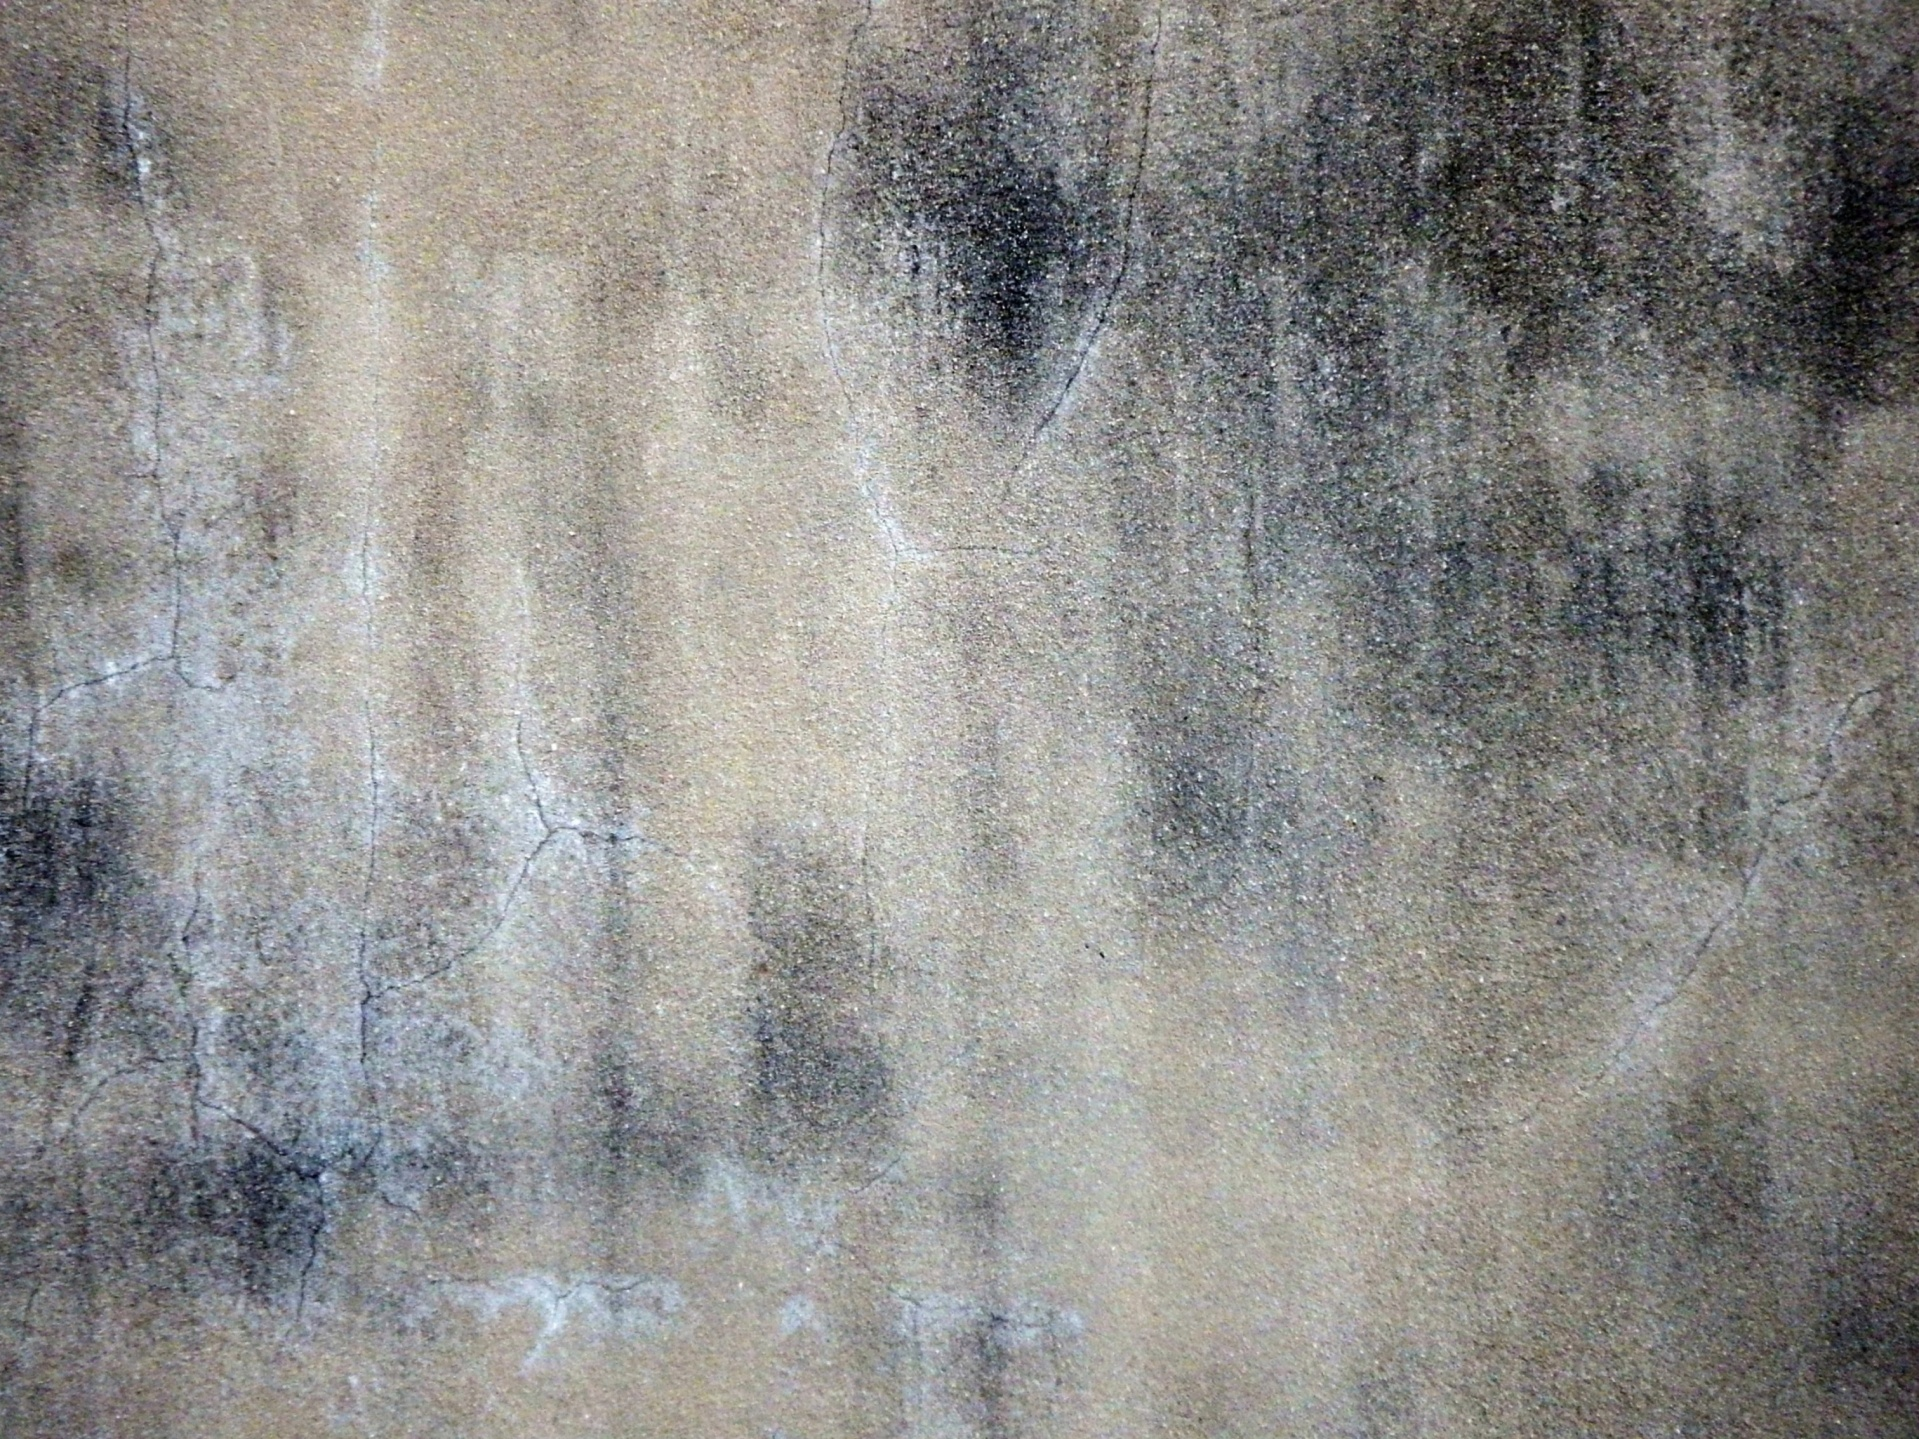 Dark Grey Concrete Texture Free Stock Photo  Public